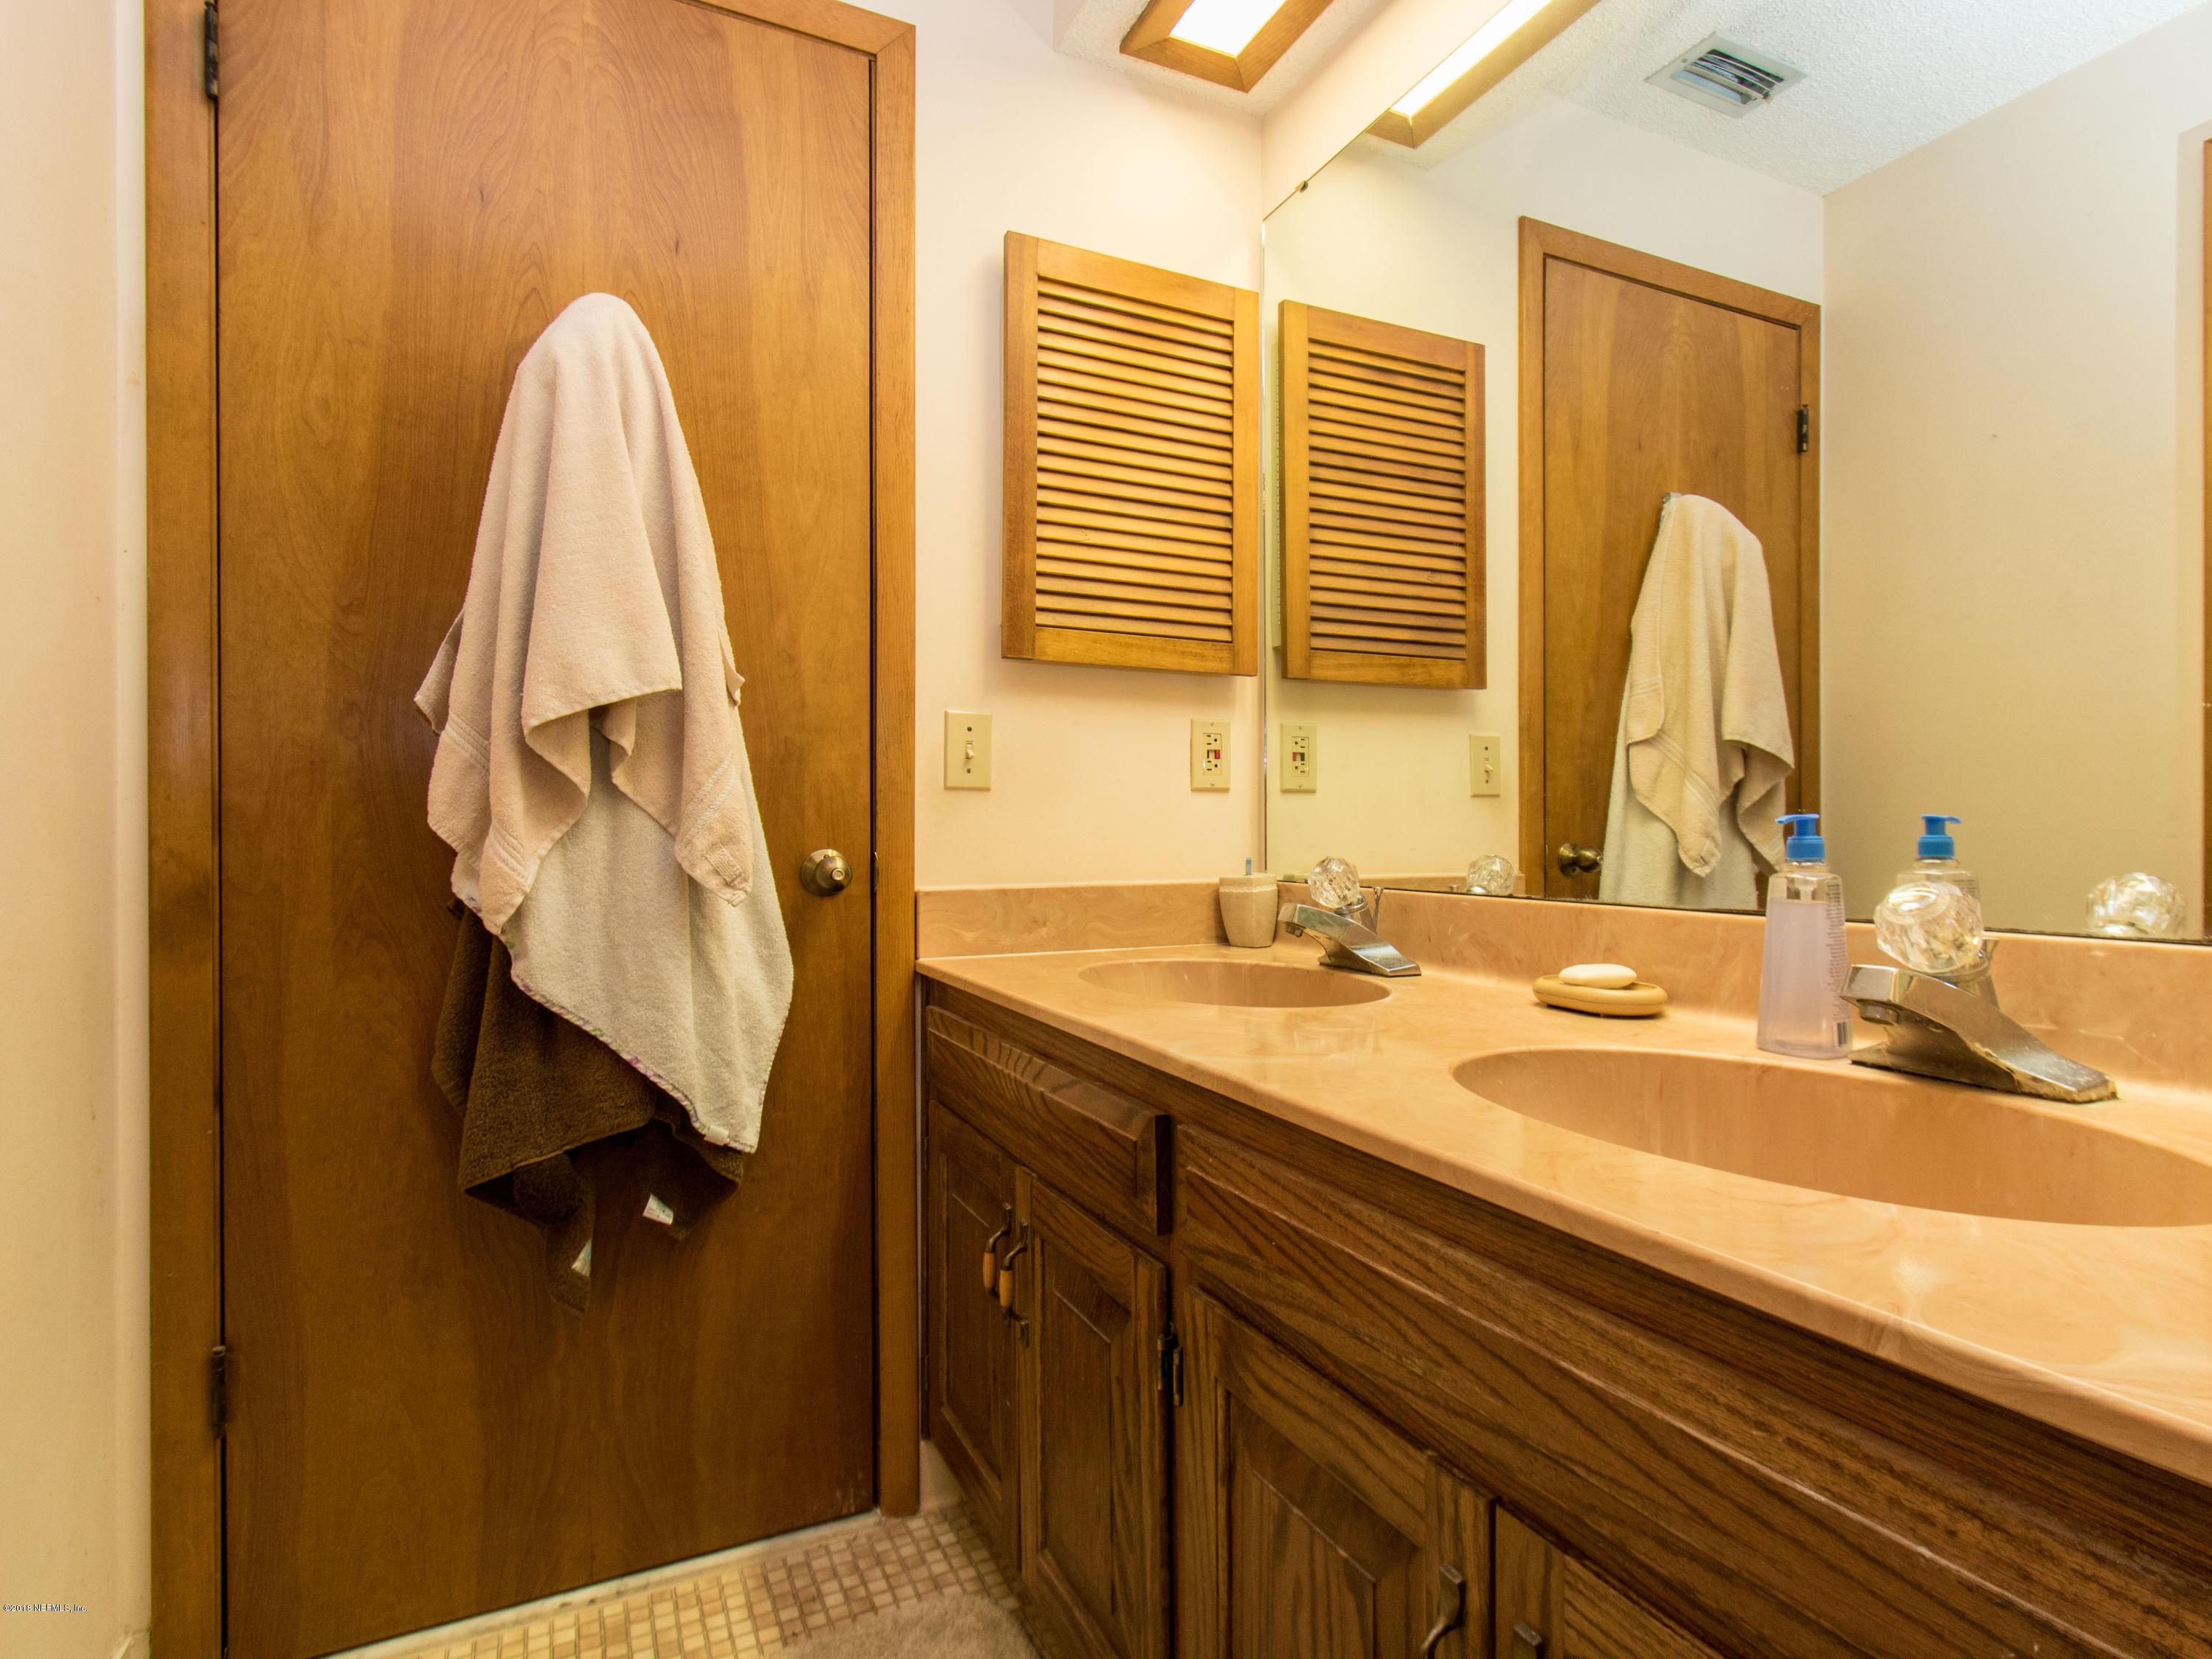 14004 MANDARIN OAKS, JACKSONVILLE, FLORIDA 32223, 5 Bedrooms Bedrooms, ,4 BathroomsBathrooms,Residential - single family,For sale,MANDARIN OAKS,914322